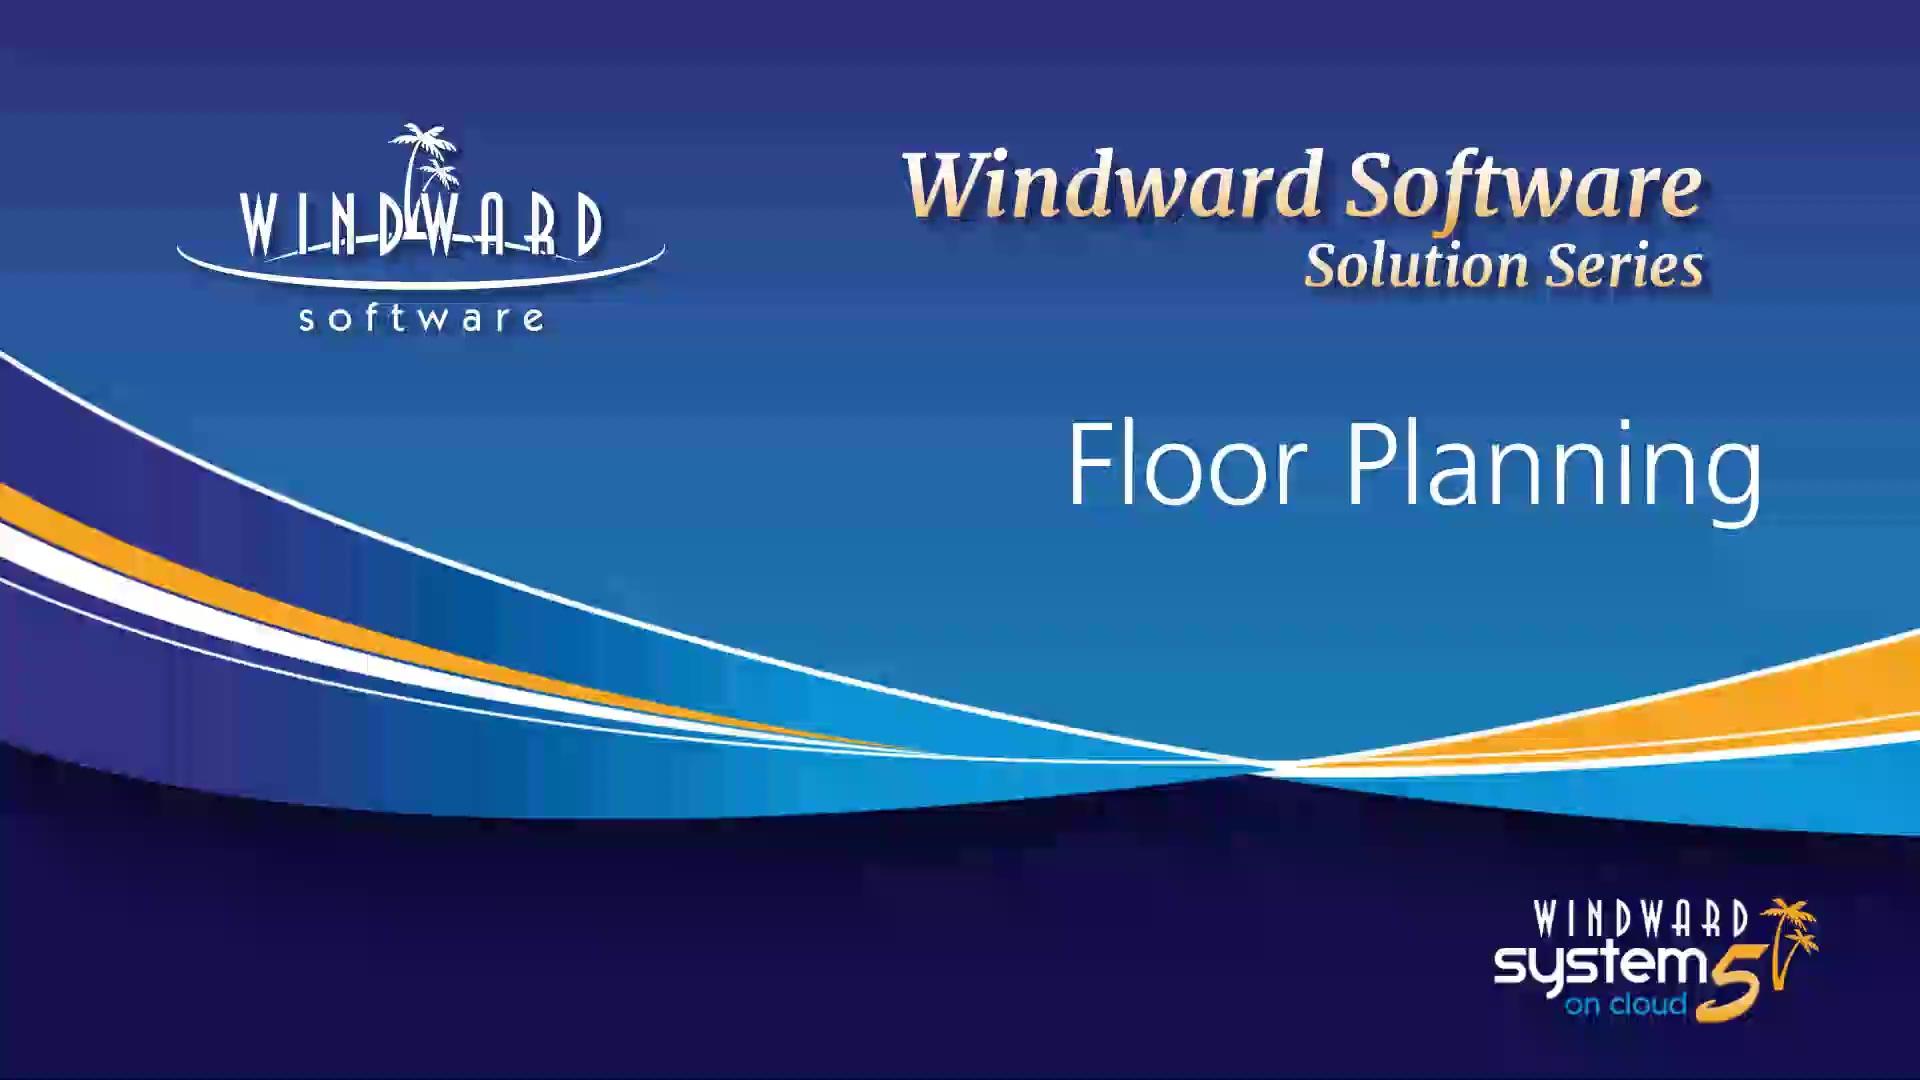 floor-planning-windward-solution-series